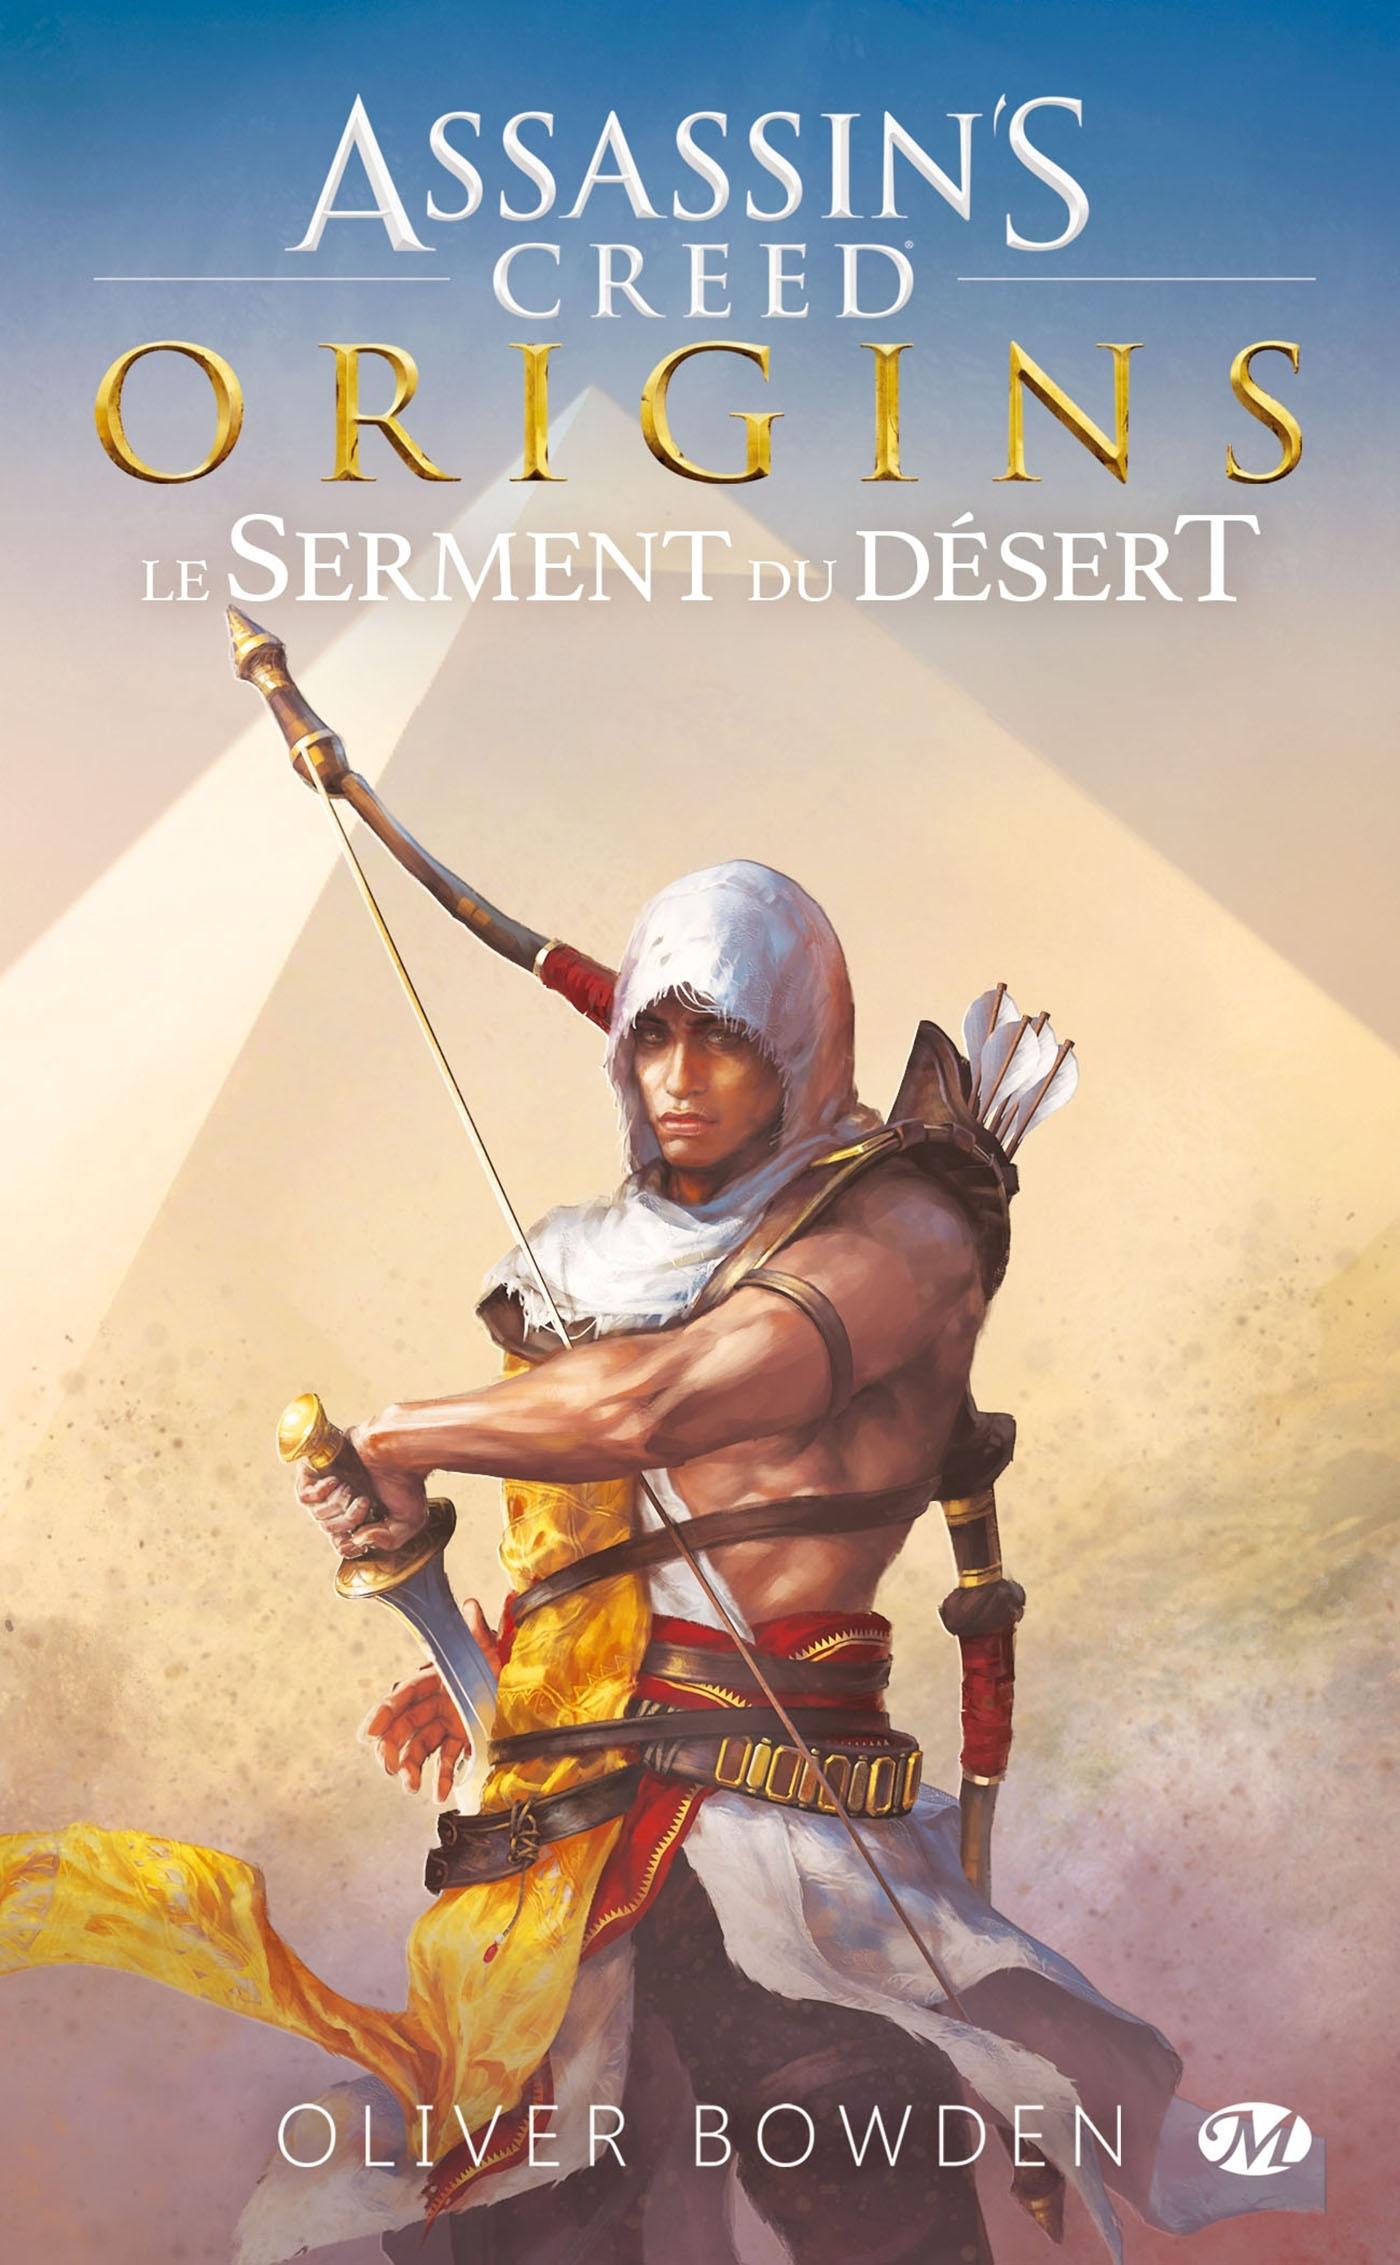 ASSASSIN'S CREED : ASSASSIN'S CREED ORIGINS: LE SERMENT DU DESERT